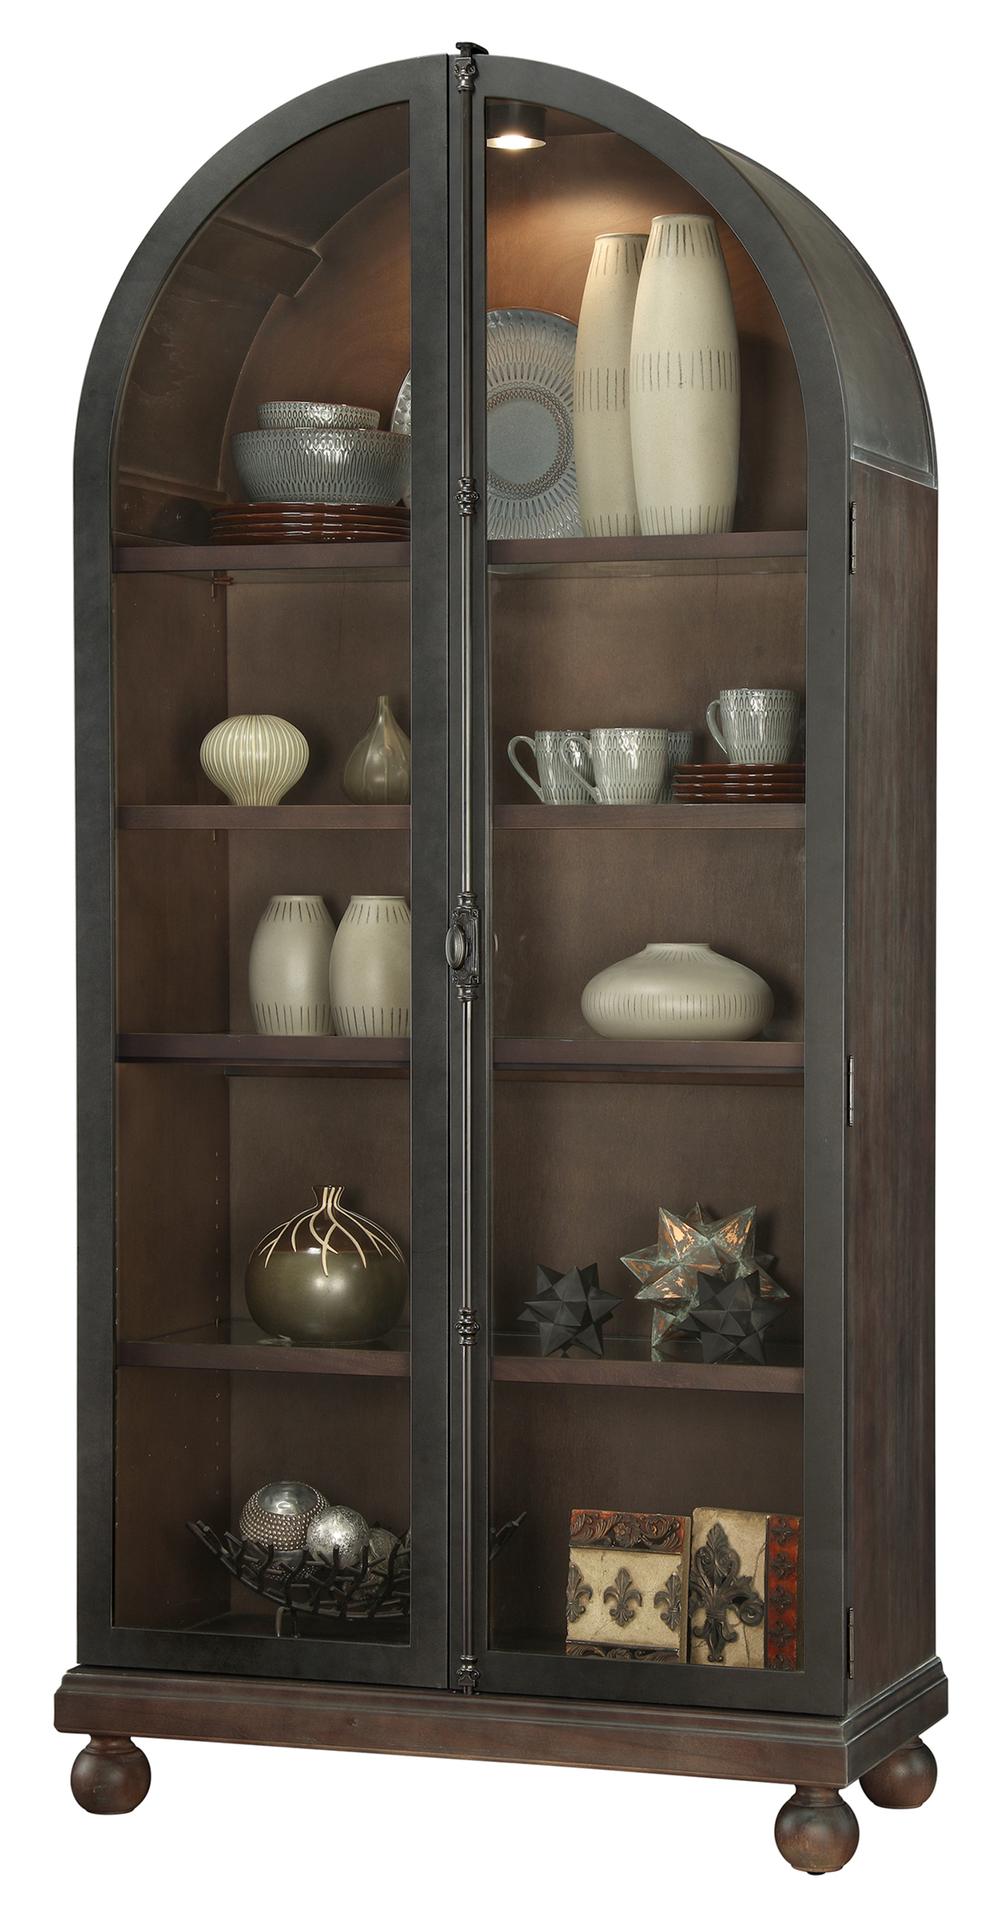 Howard Miller Clock - Naomi Curio Cabinet